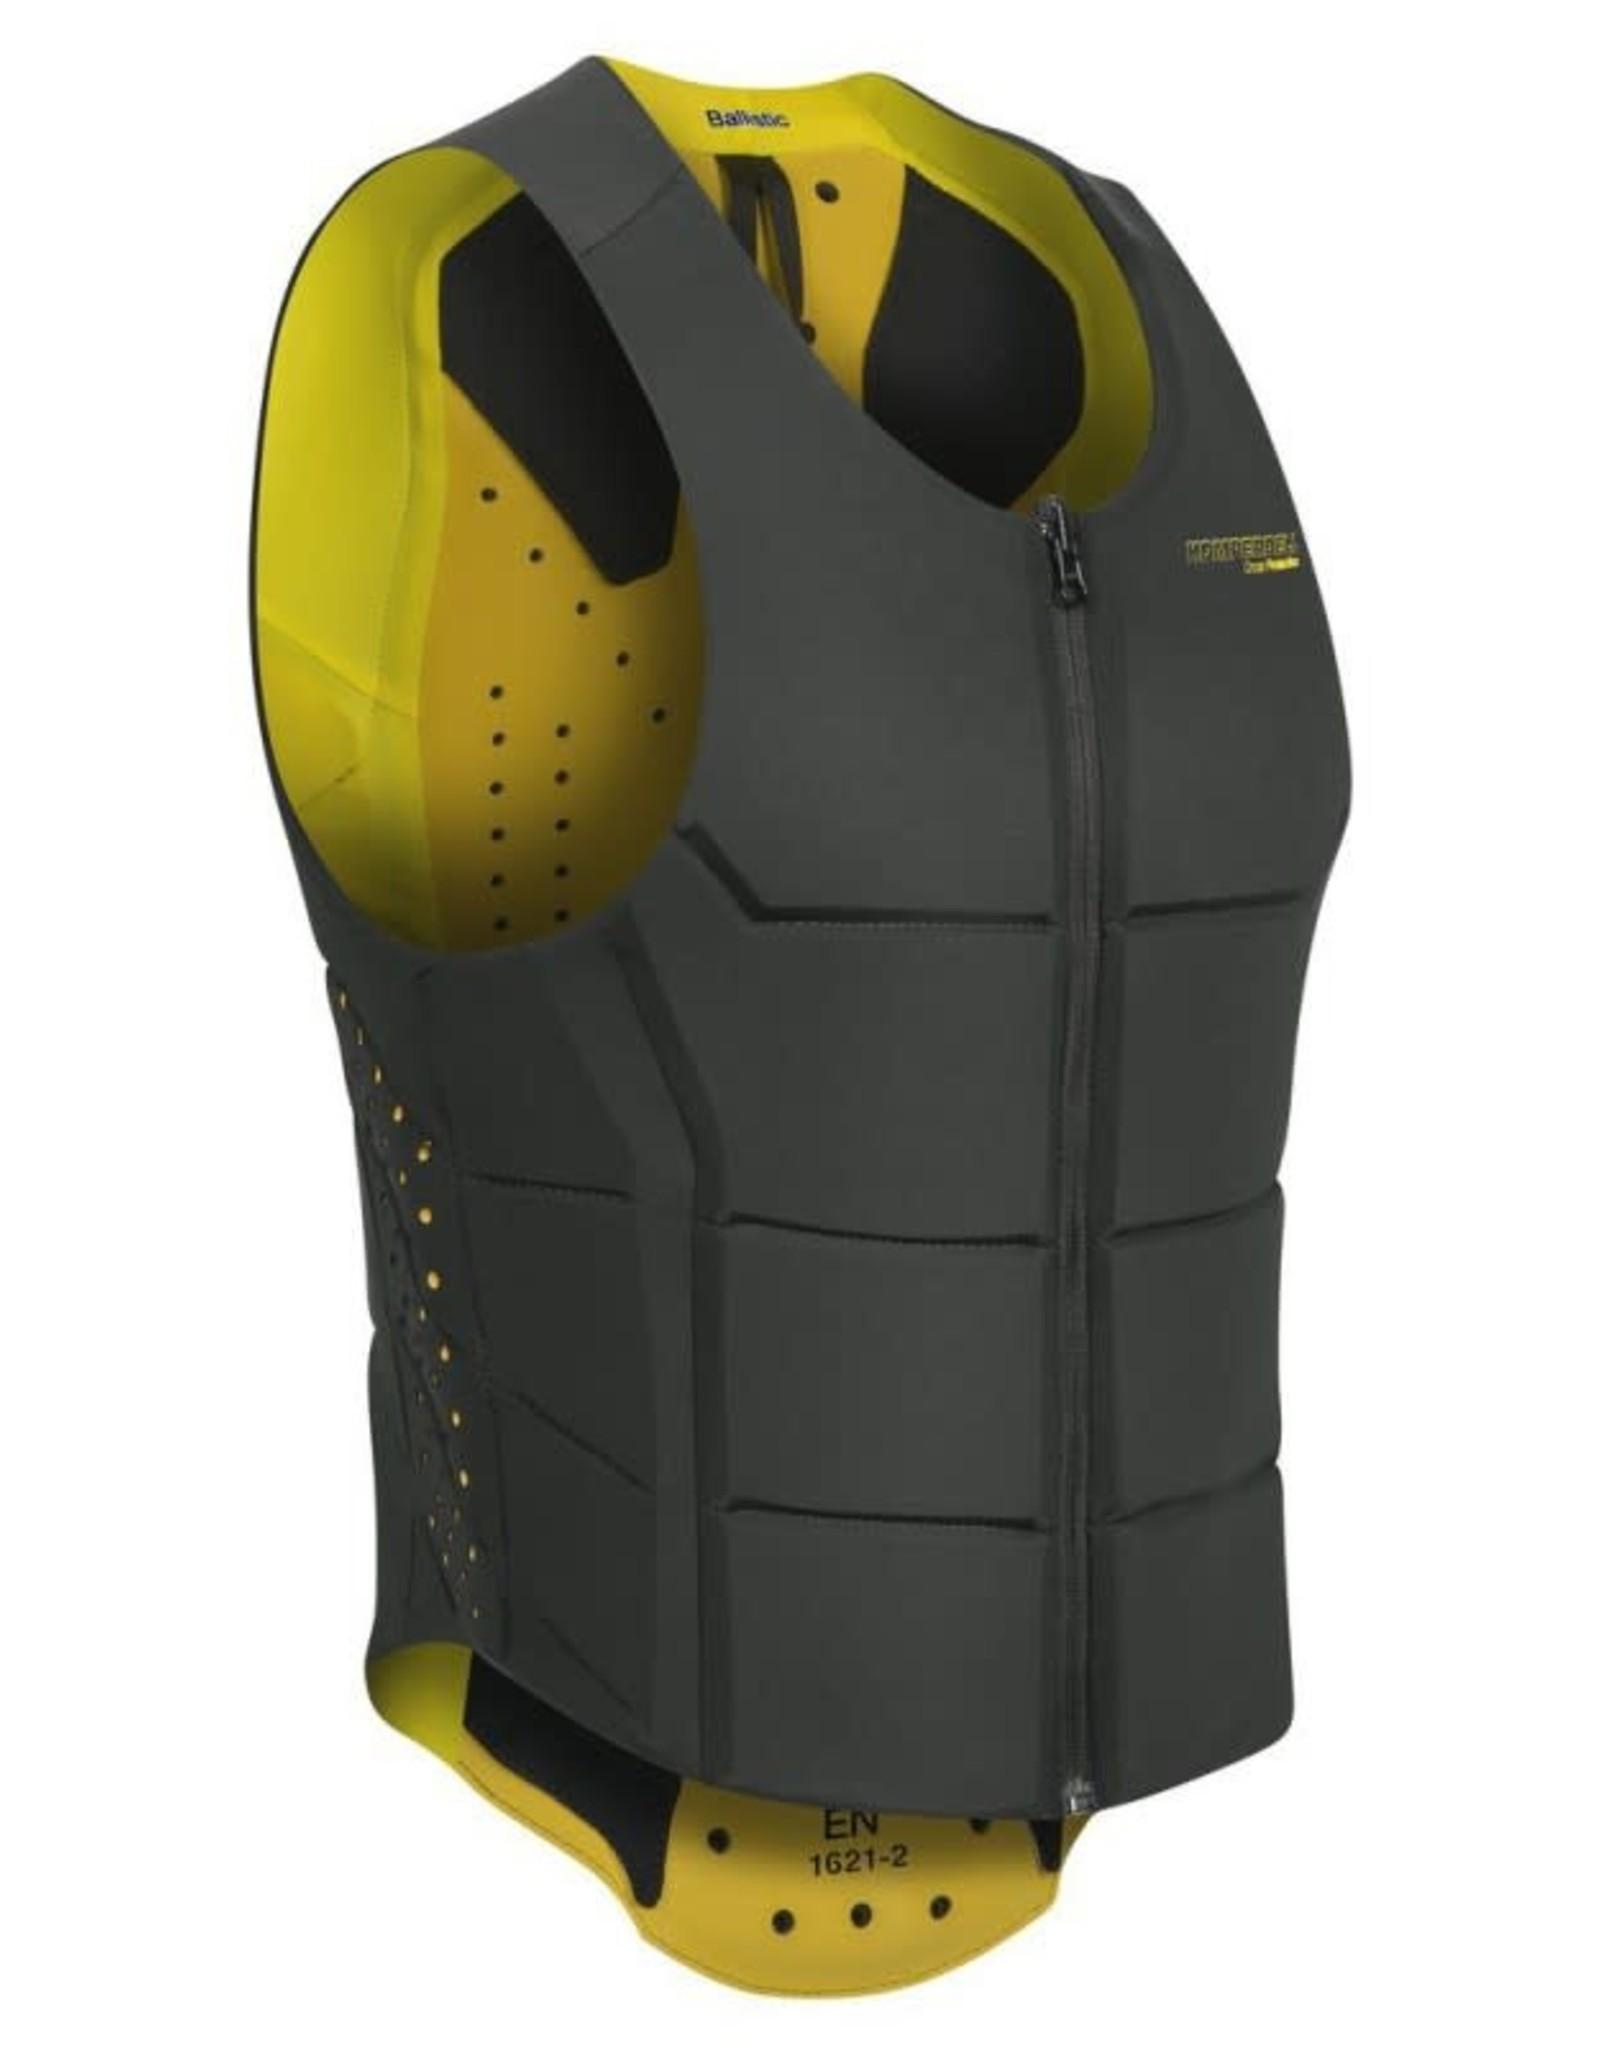 Komperdell KOMPERDELL Unisex rugprotector